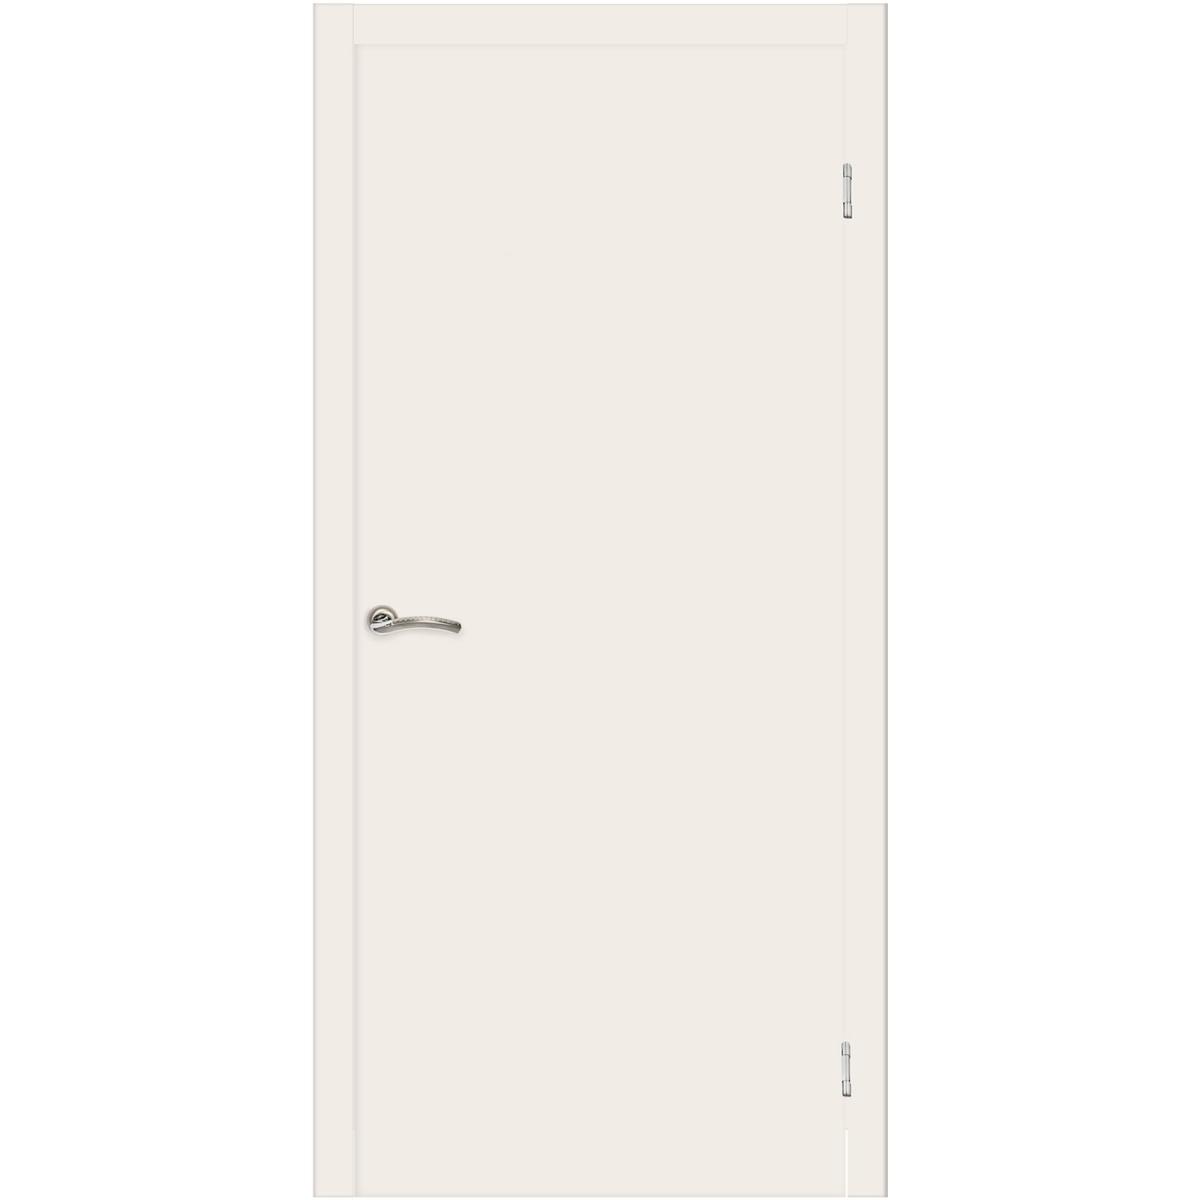 Дверь межкомнатная глухая 90x200 см ламинация цвет белый